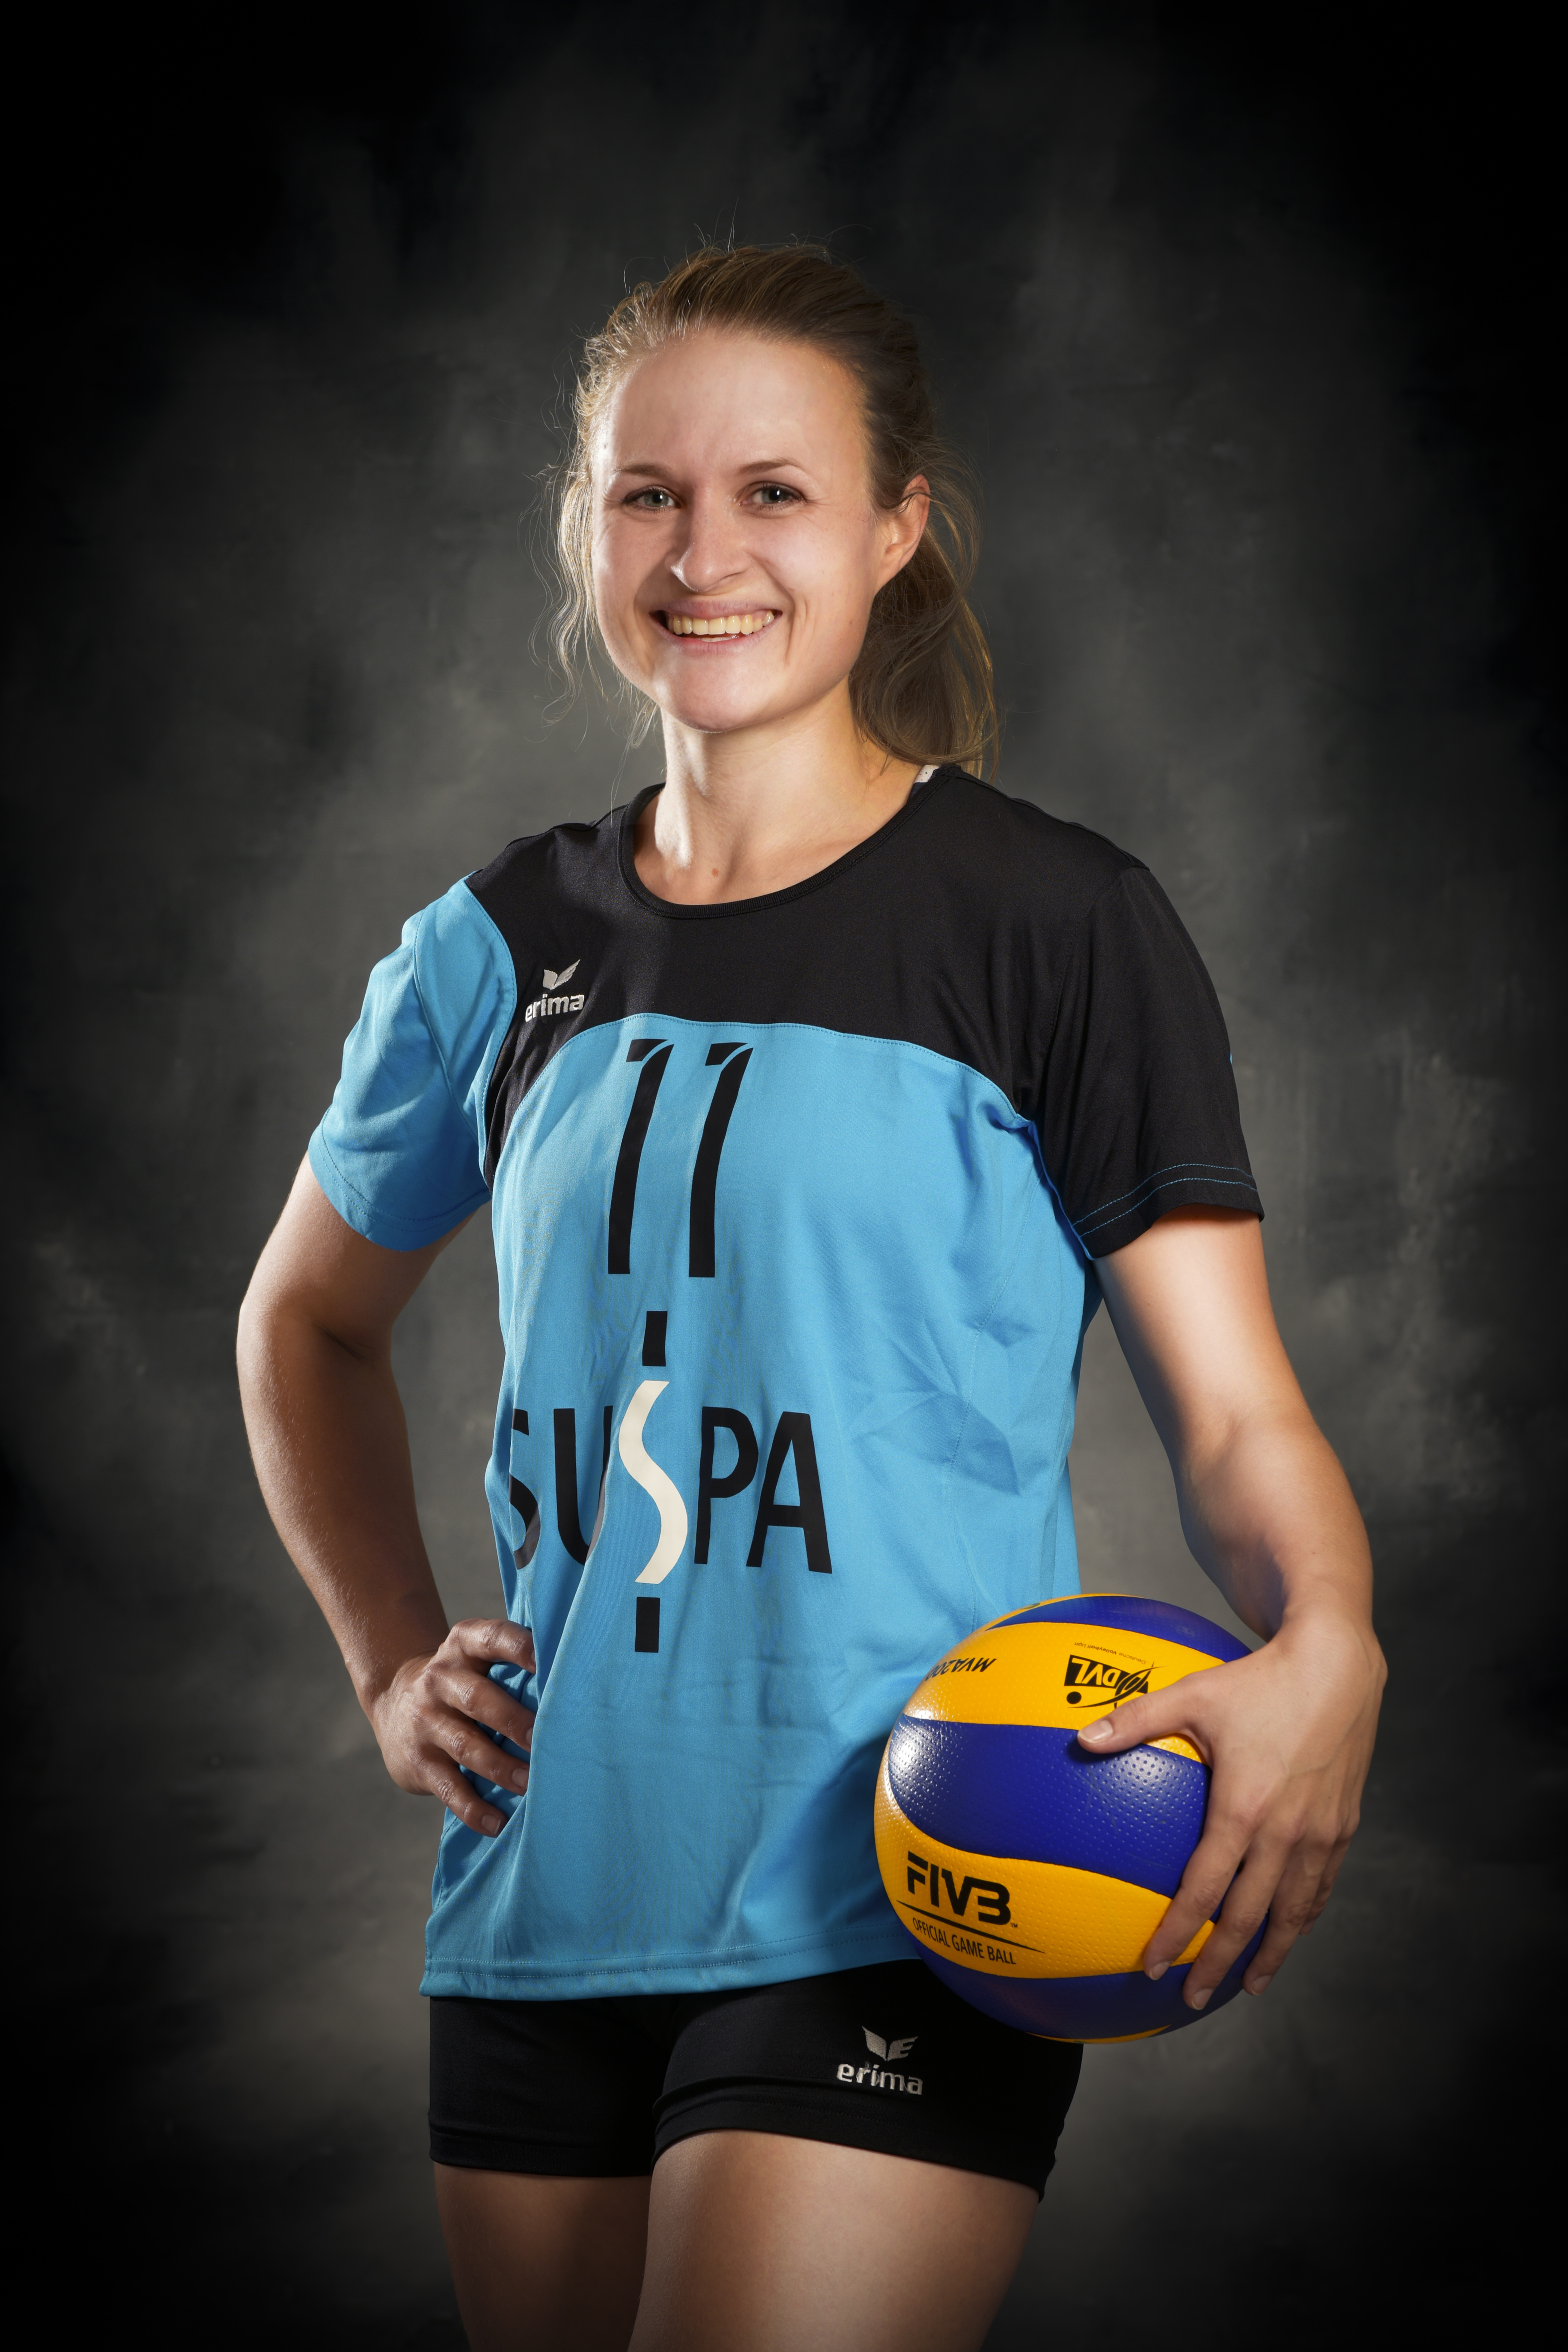 Astrid Fürg